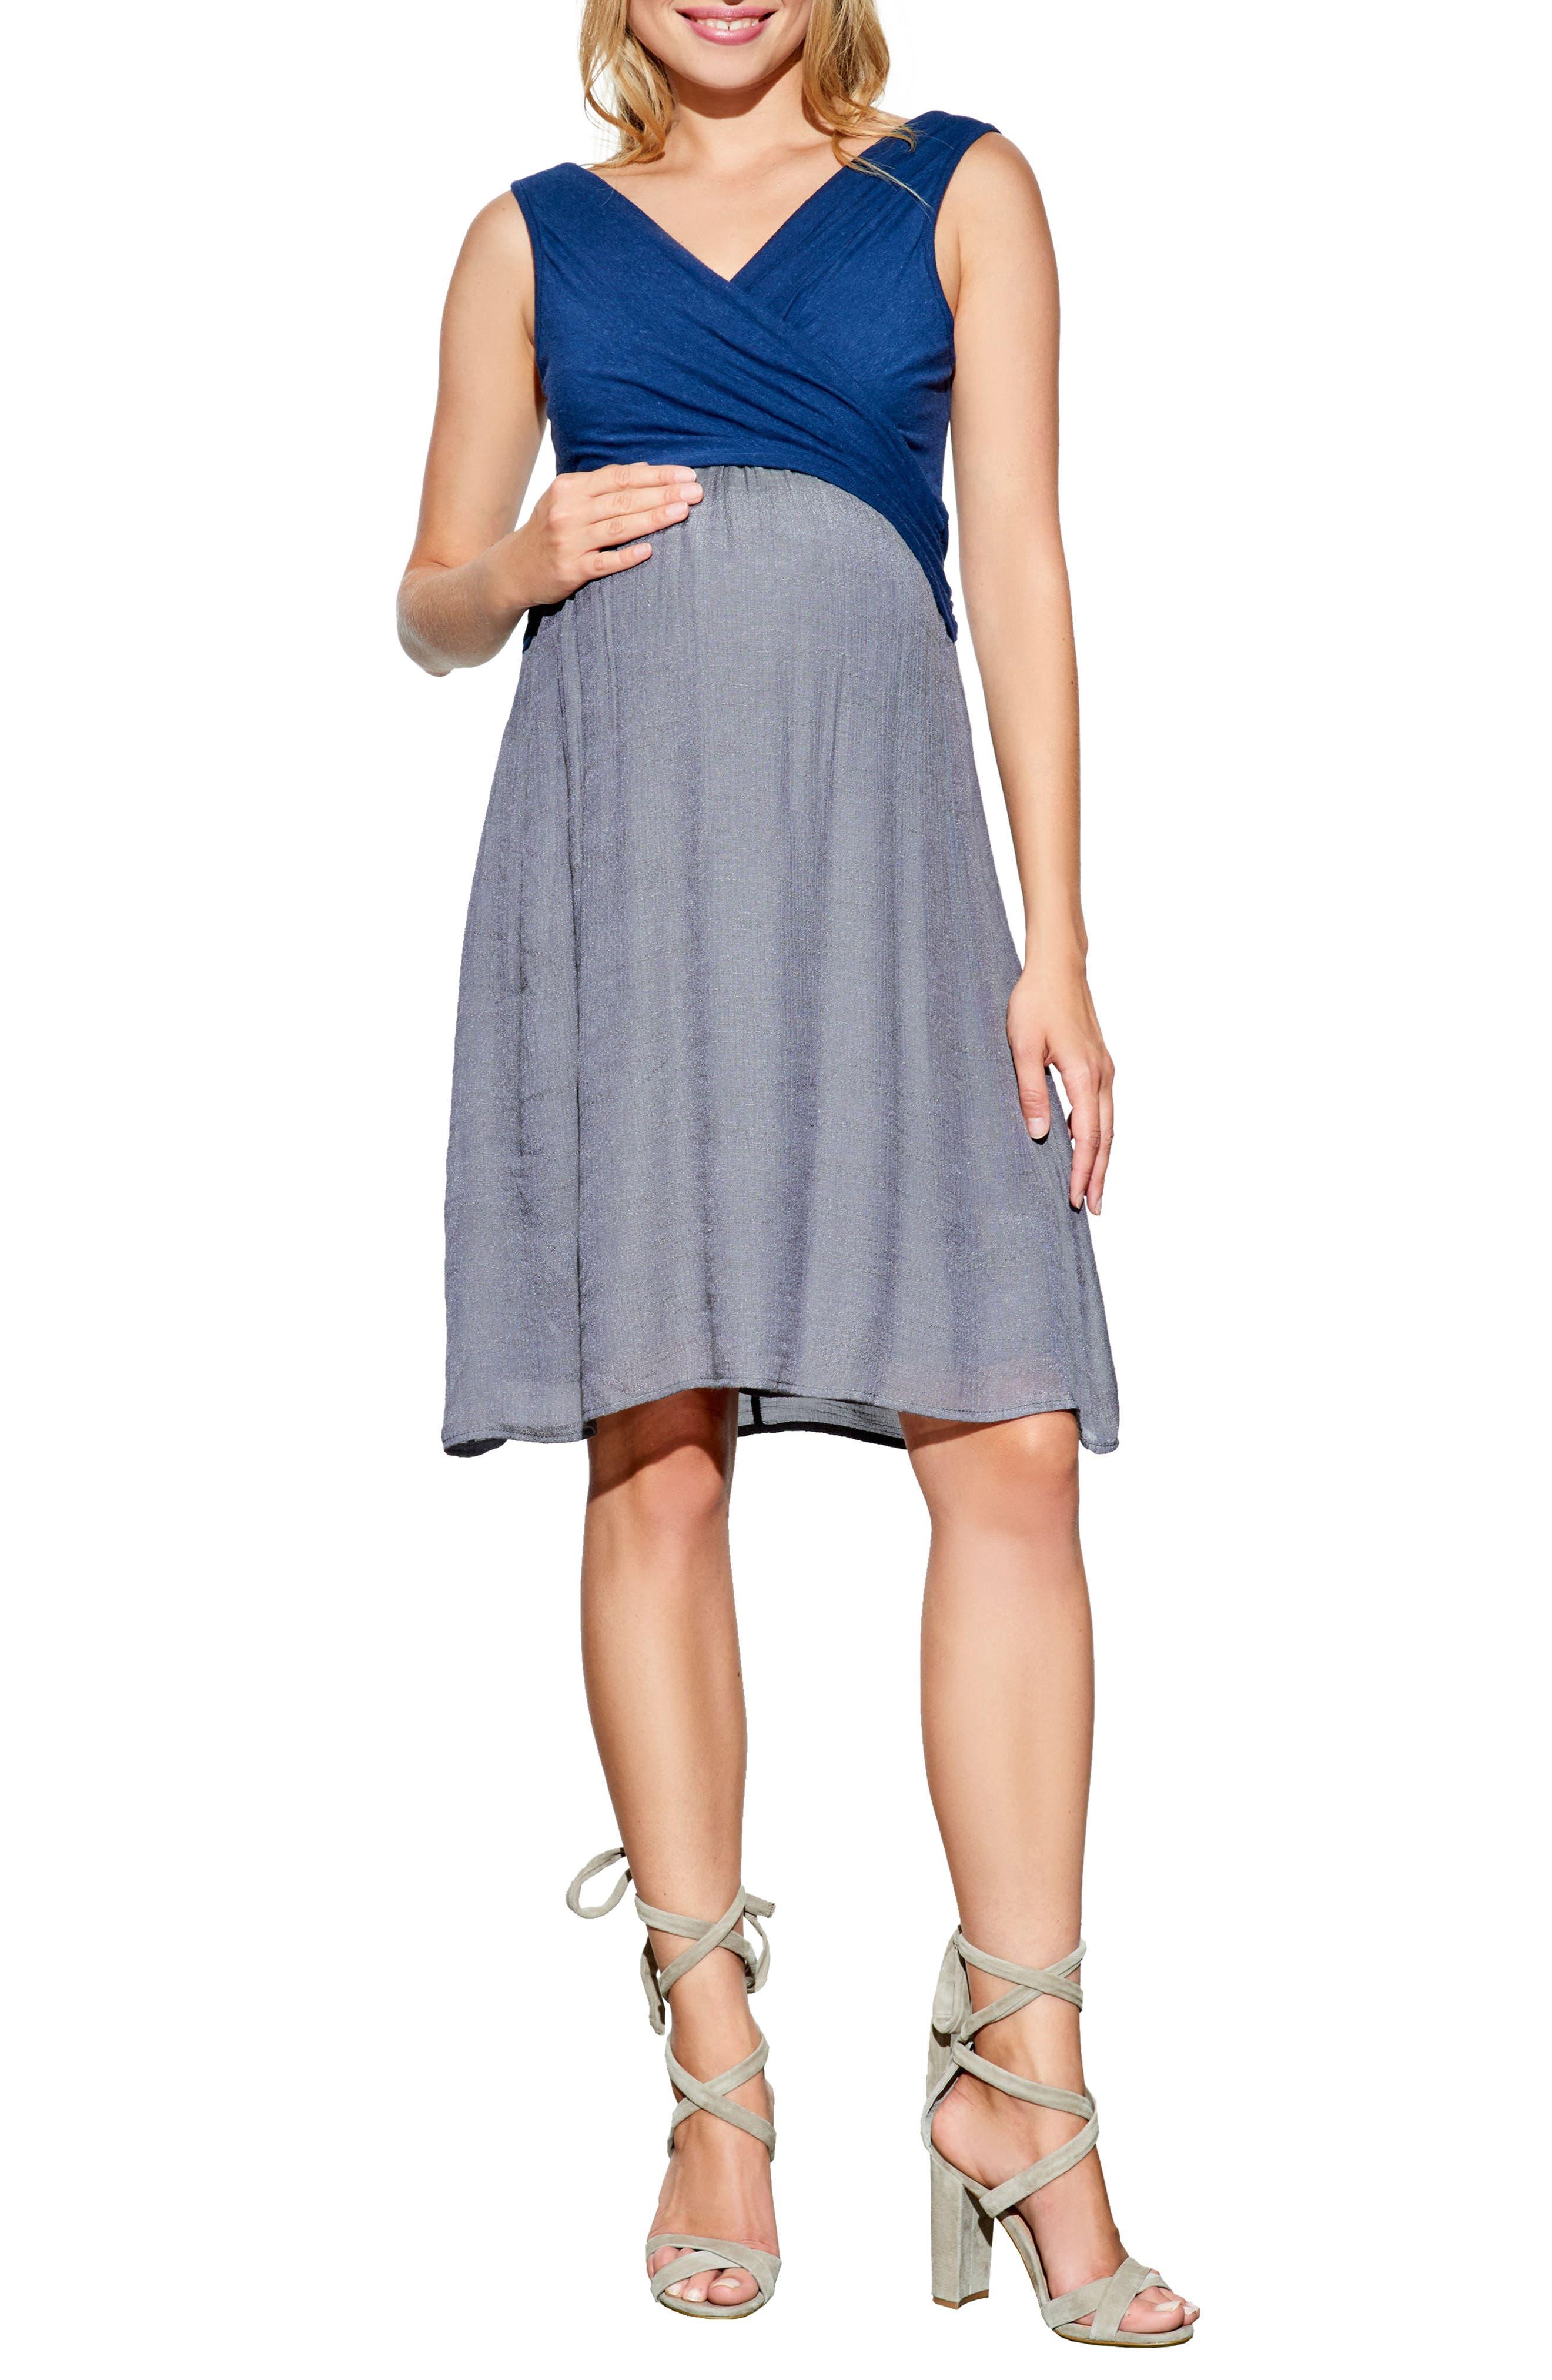 Surplice Babydoll Maternity/Nursing Dress,                         Main,                         color, Navy/ Charcoal